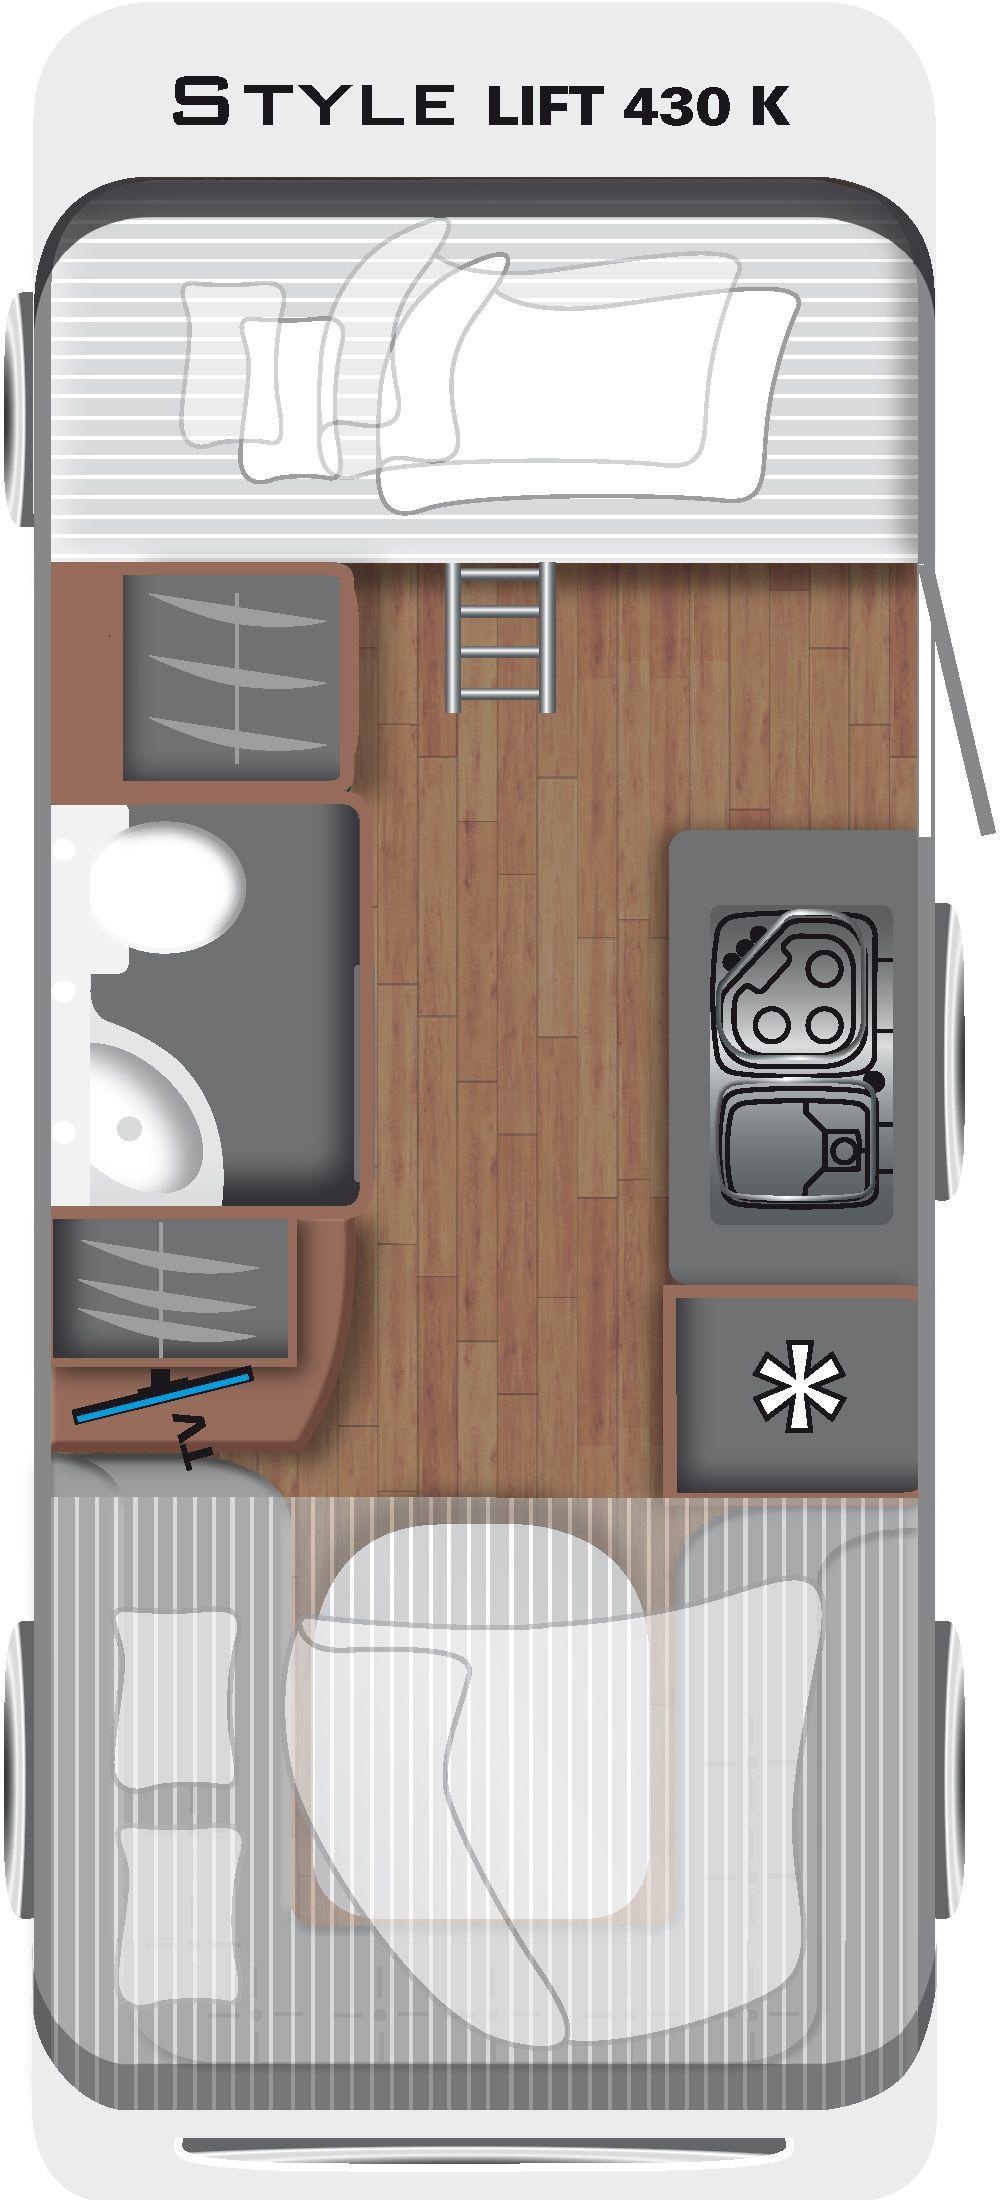 Style Lift 430 K